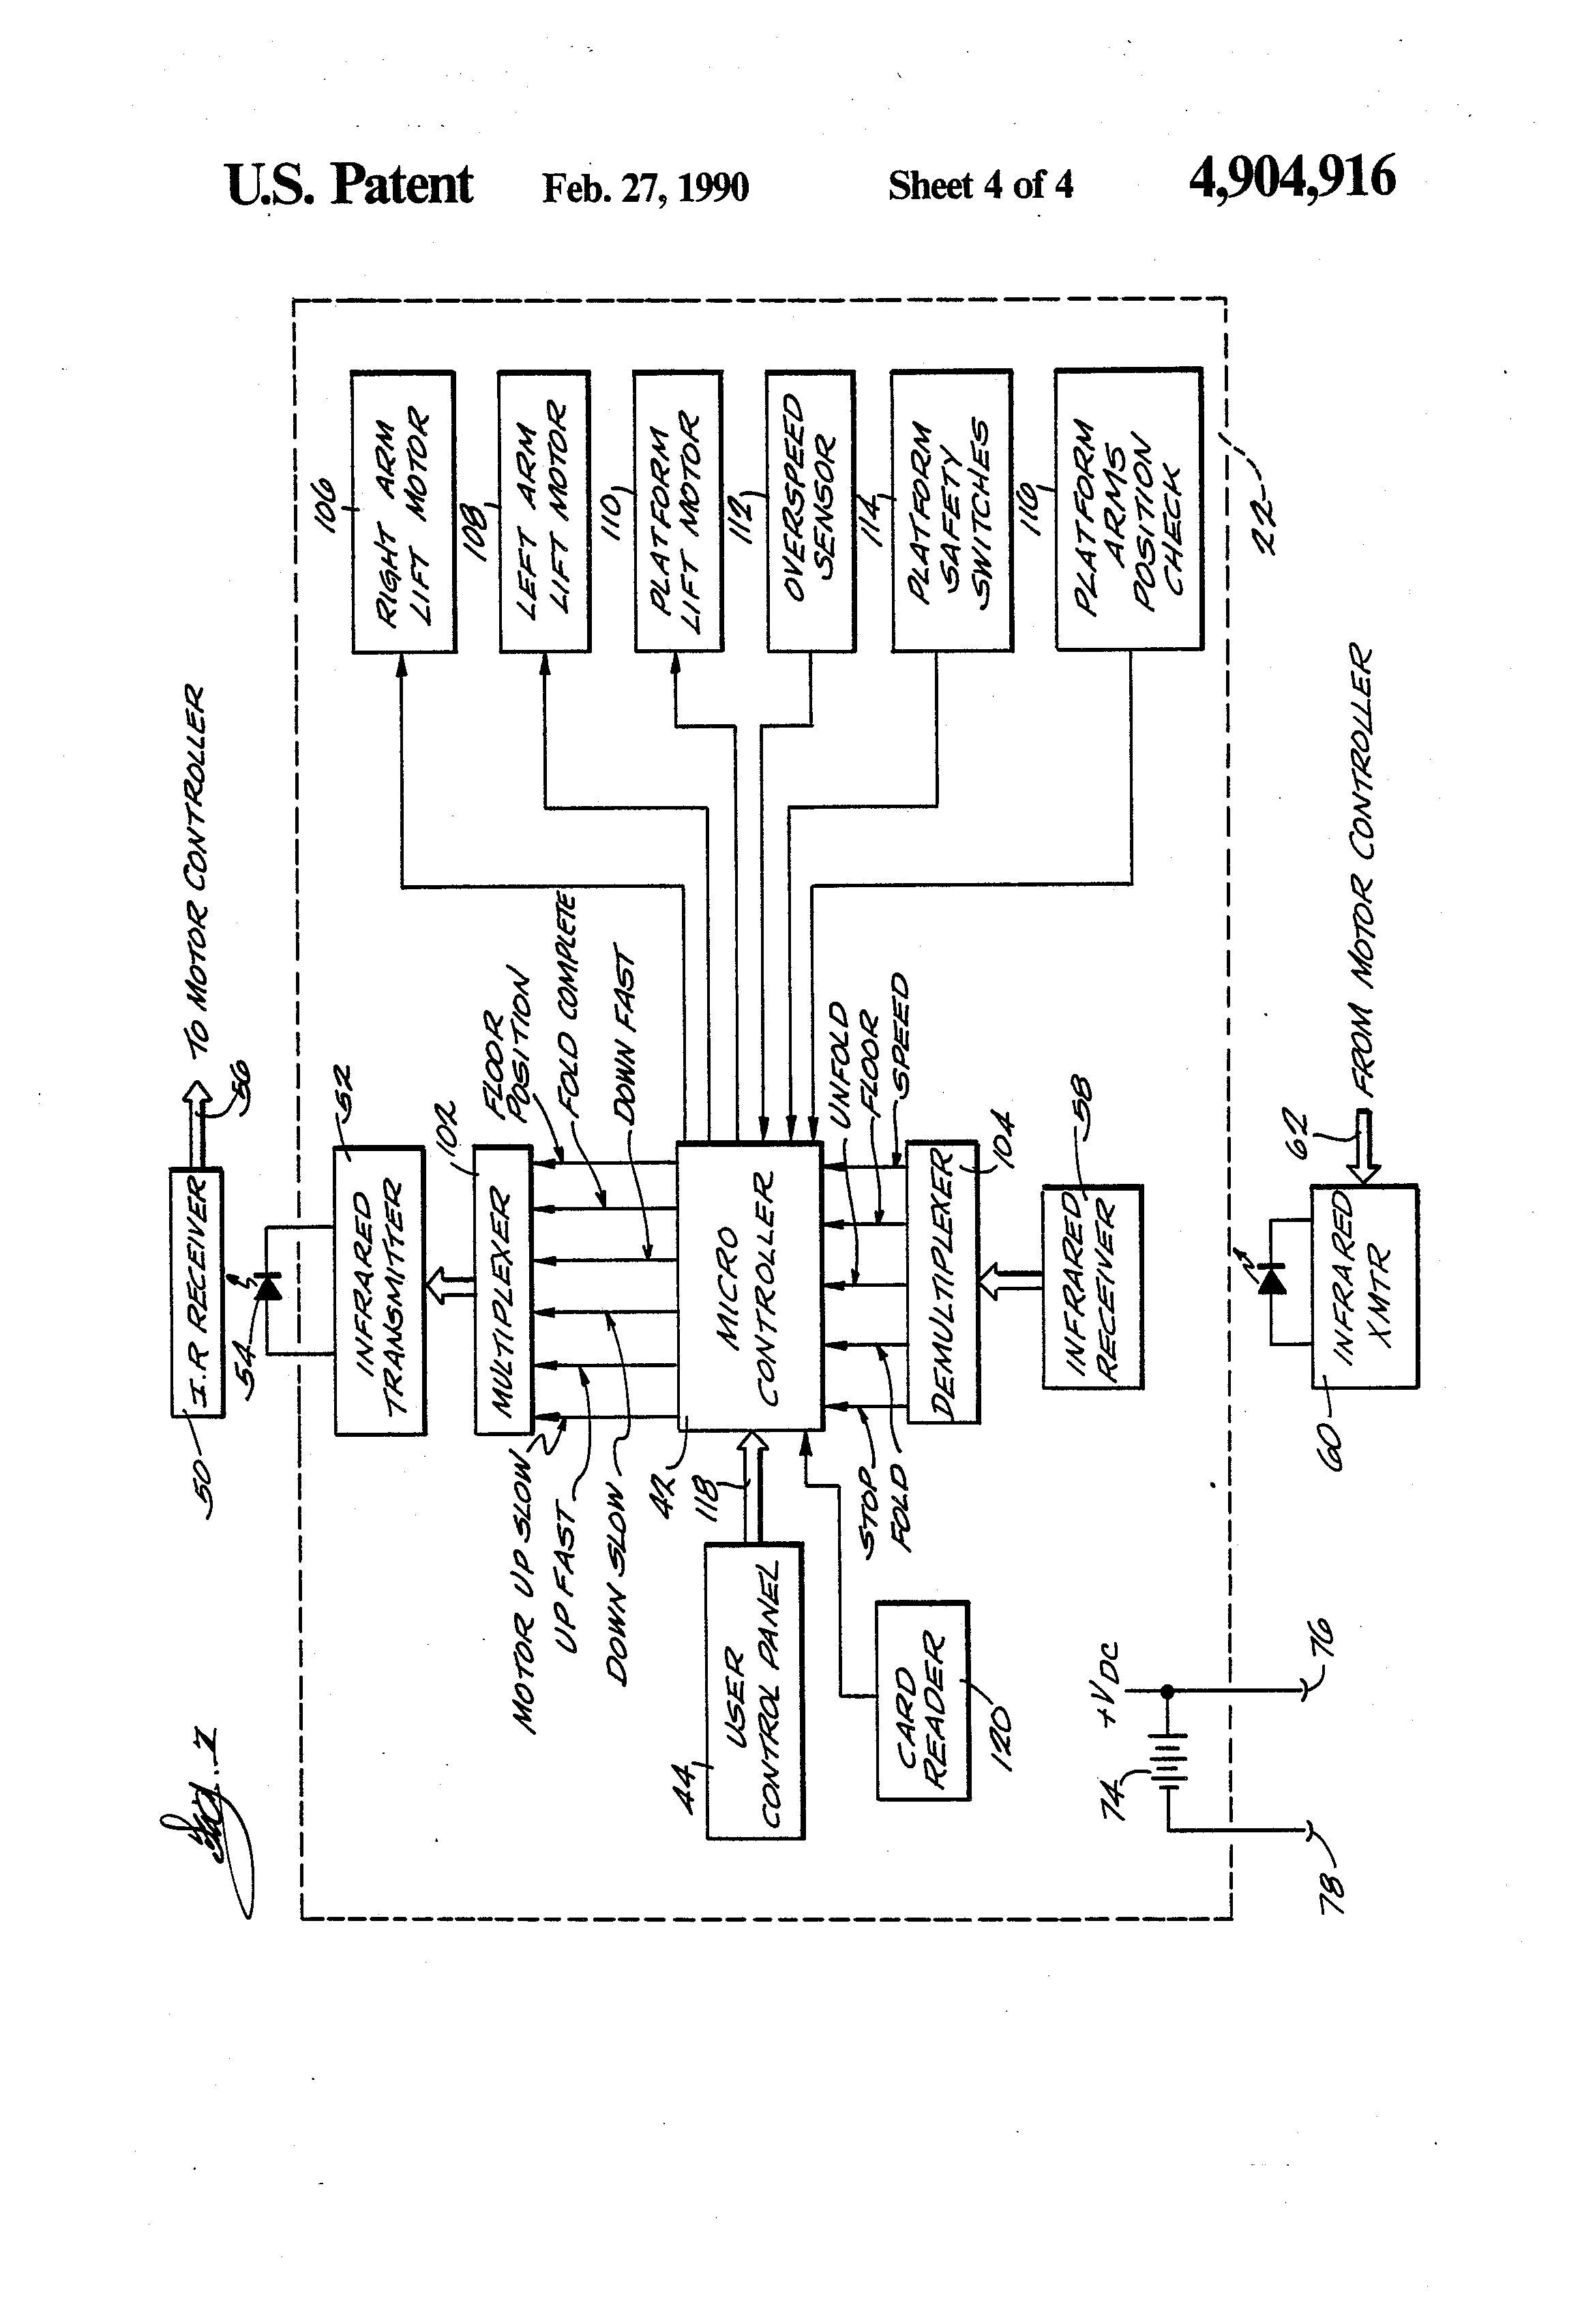 Wiring Diagram 1930 Snorkle Scissor Lift Med Lift Wire Diagrams Wiring Diagram Schematic Of Wiring Diagram 1930 Snorkle Scissor Lift